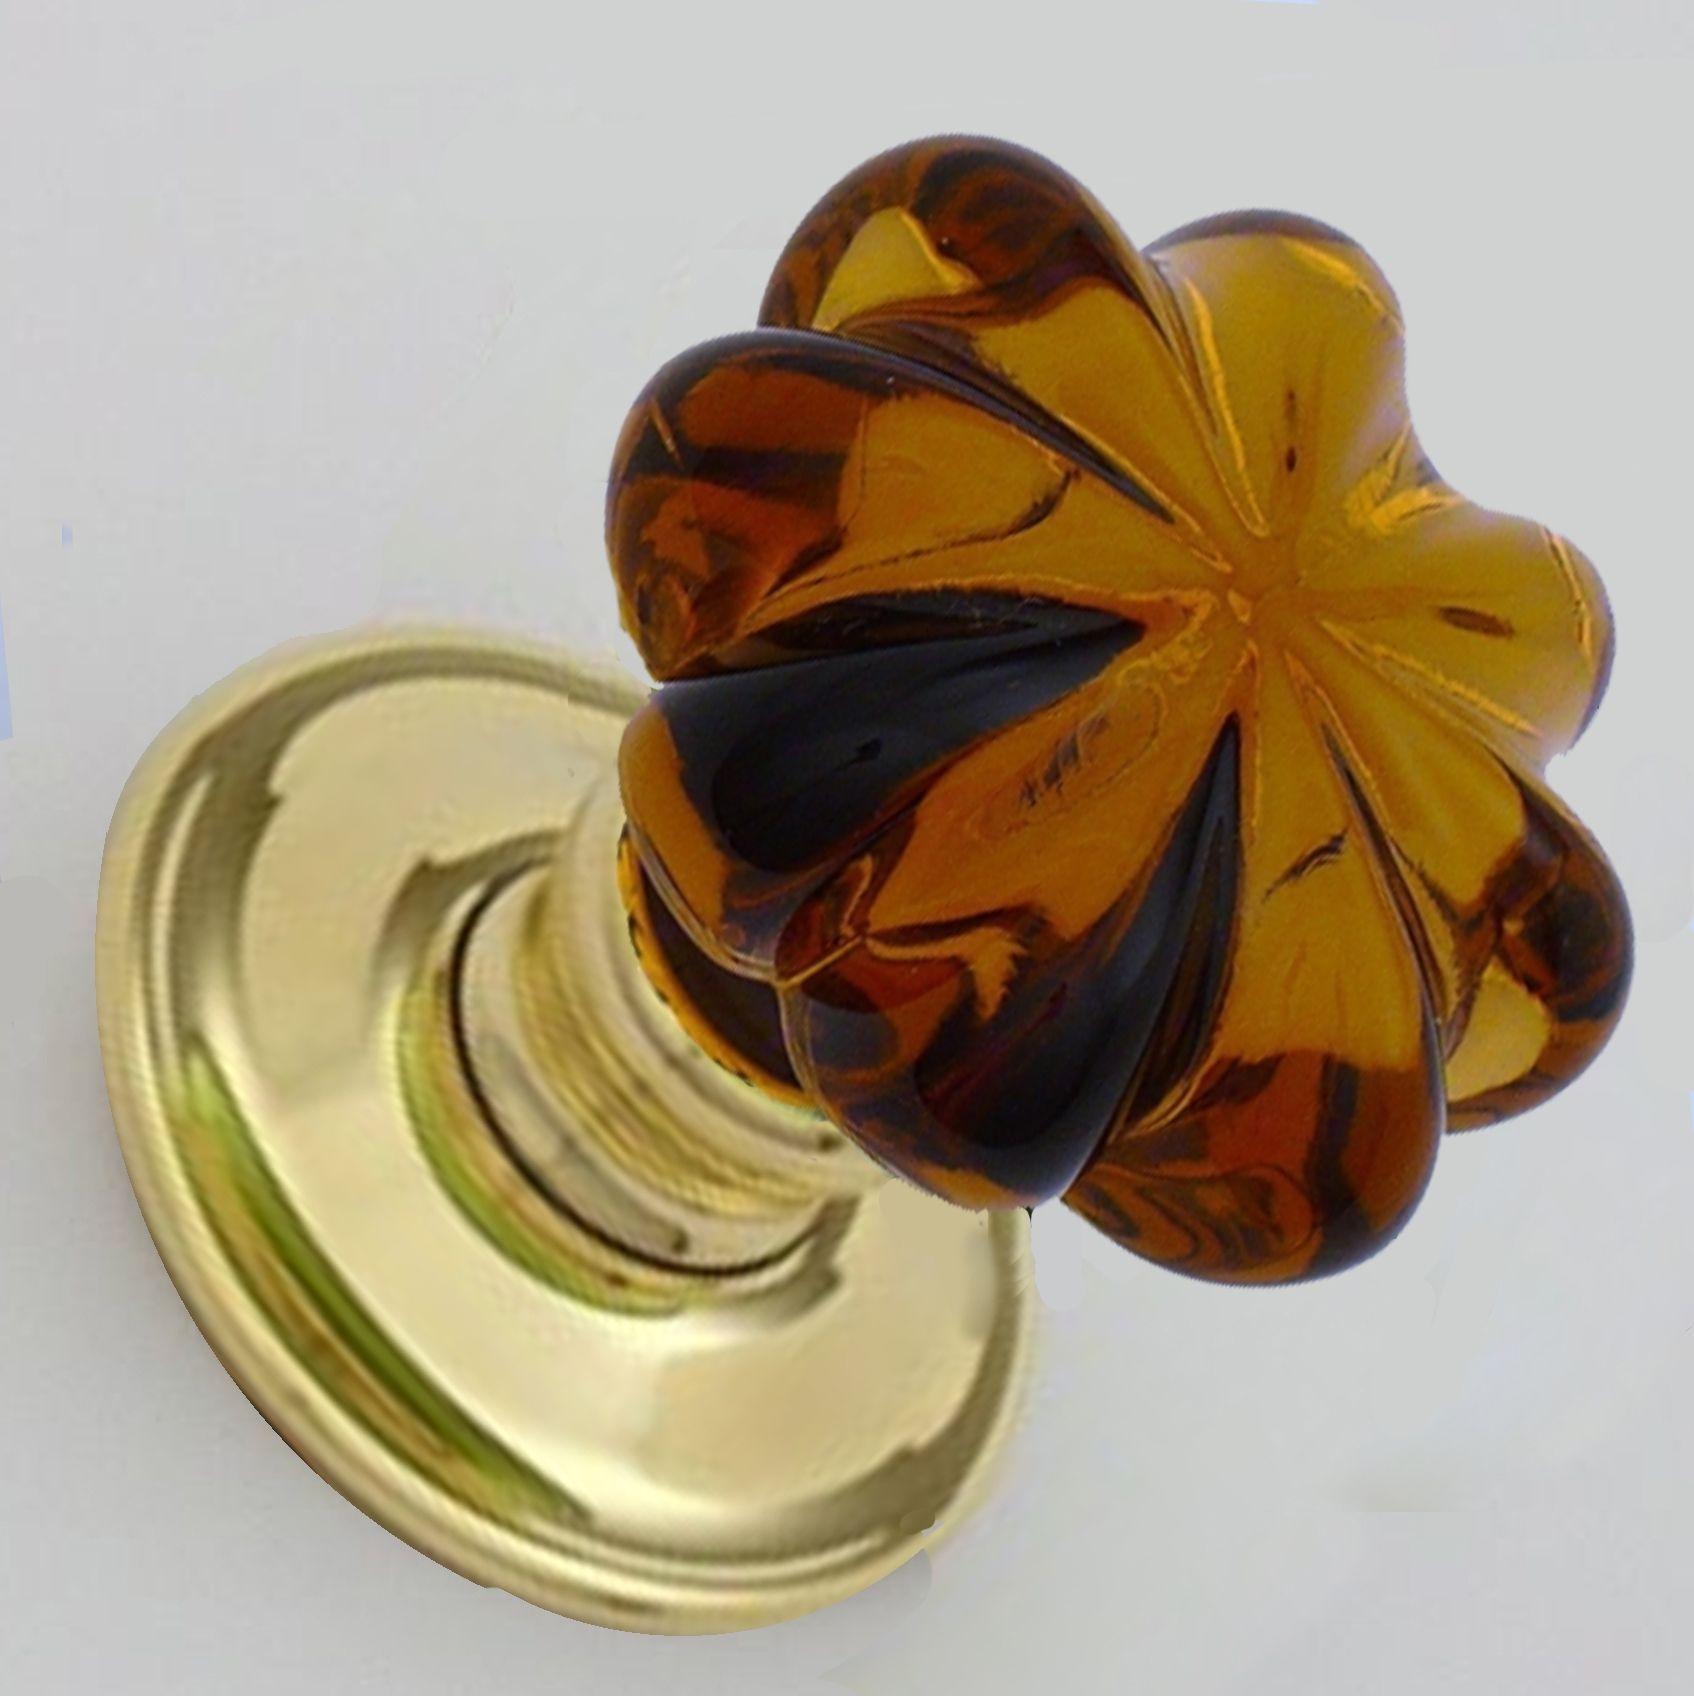 daisy flower door knobs http retrocomputinggeek com